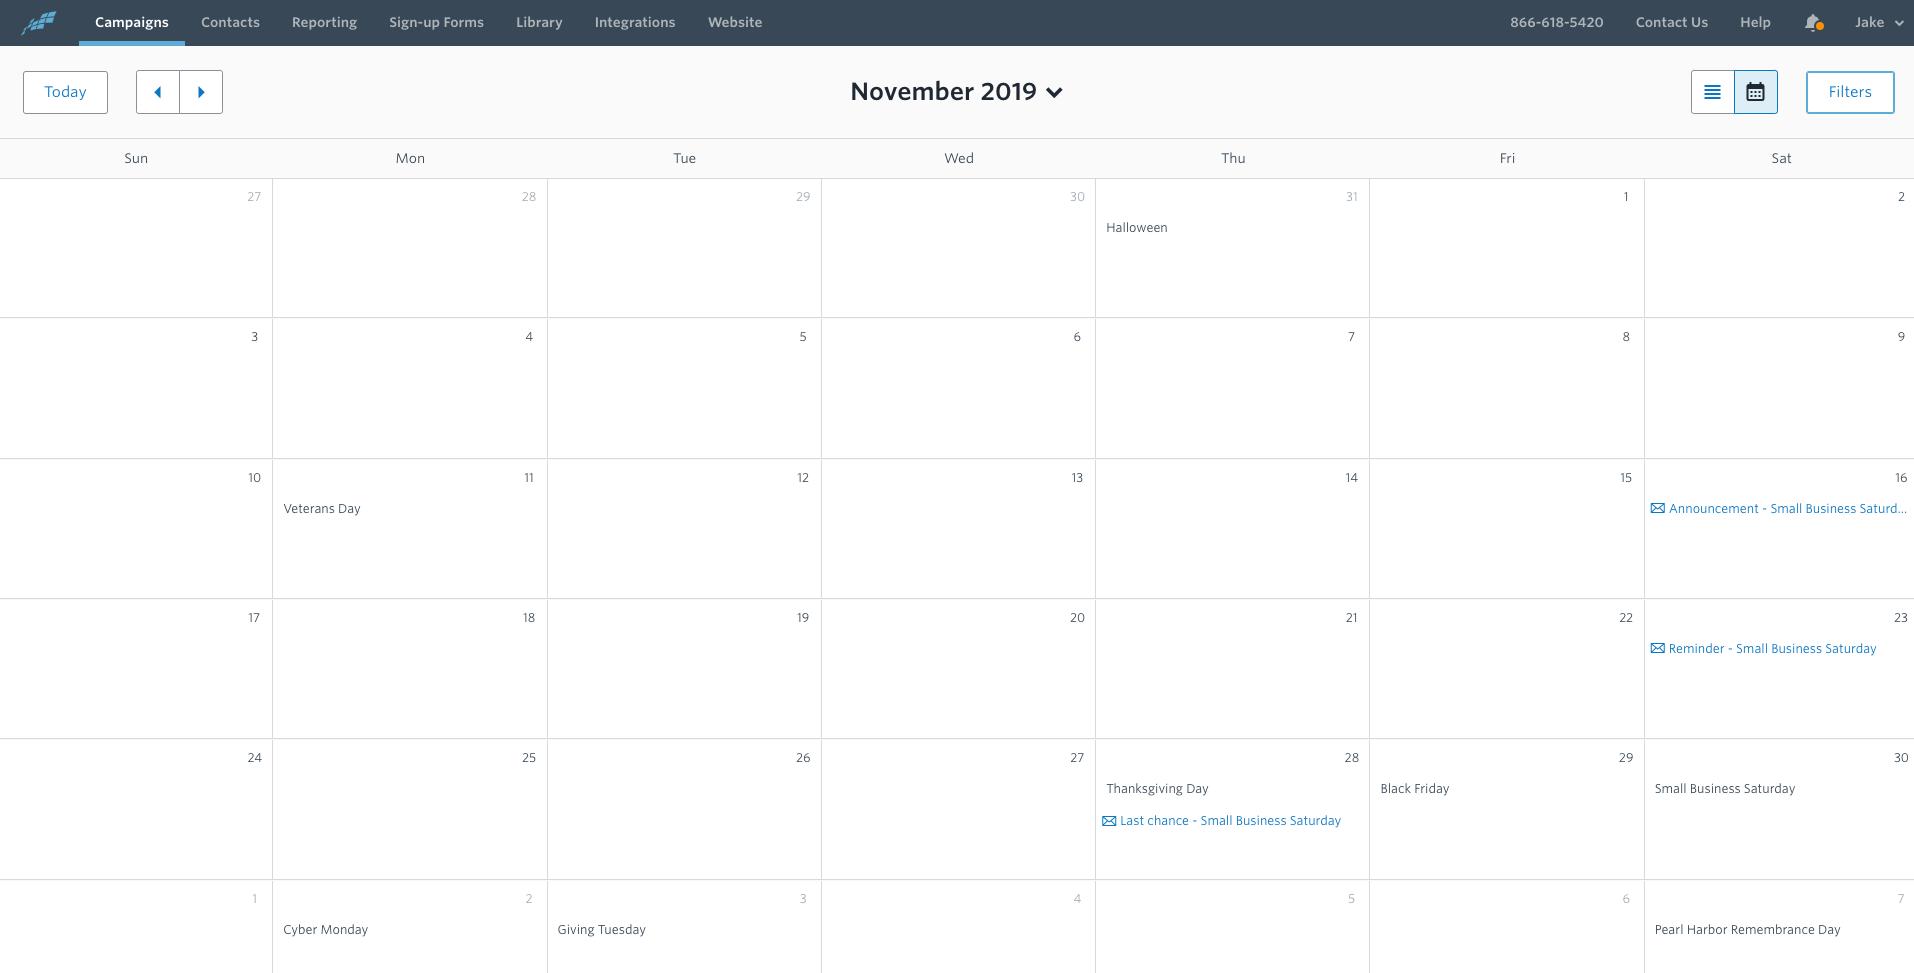 November 2019 email calendar